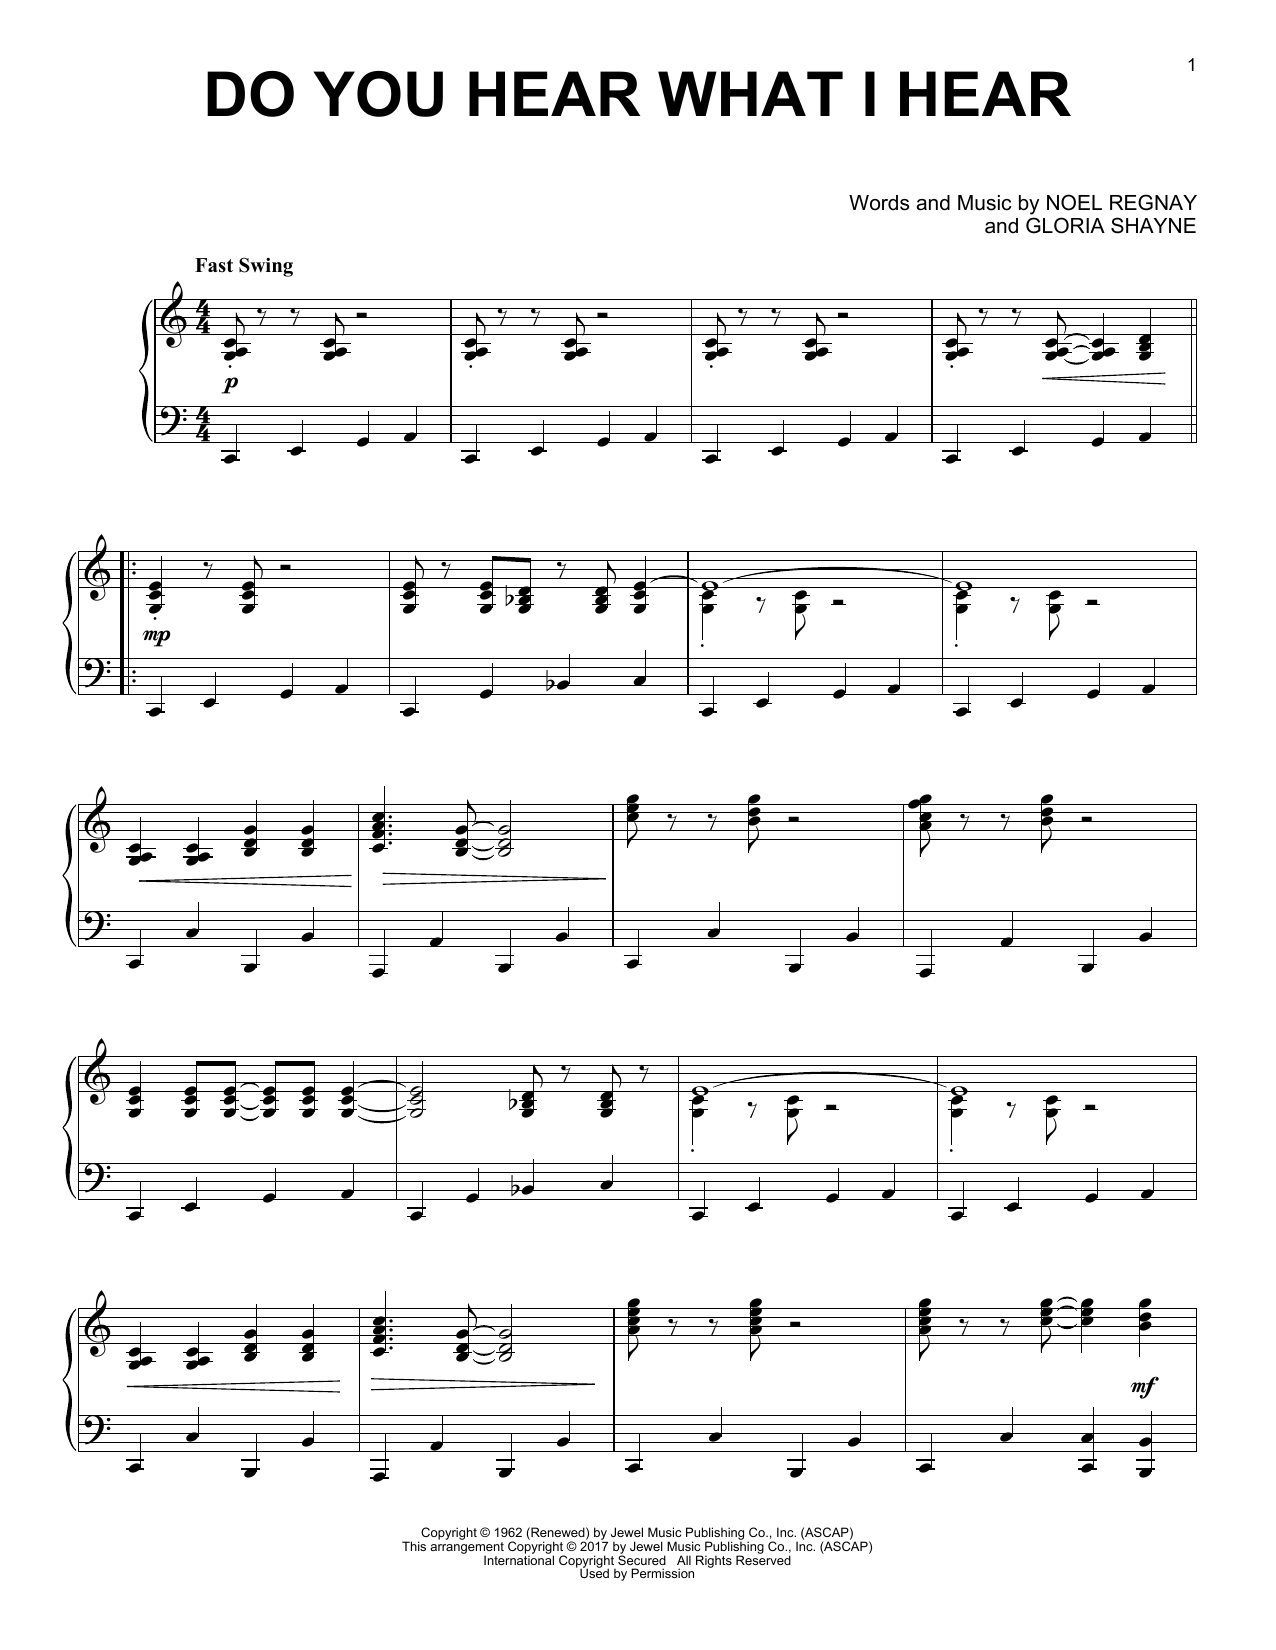 Gloria Shayne Do You Hear What I Hear [Jazz version] sheet music notes and chords